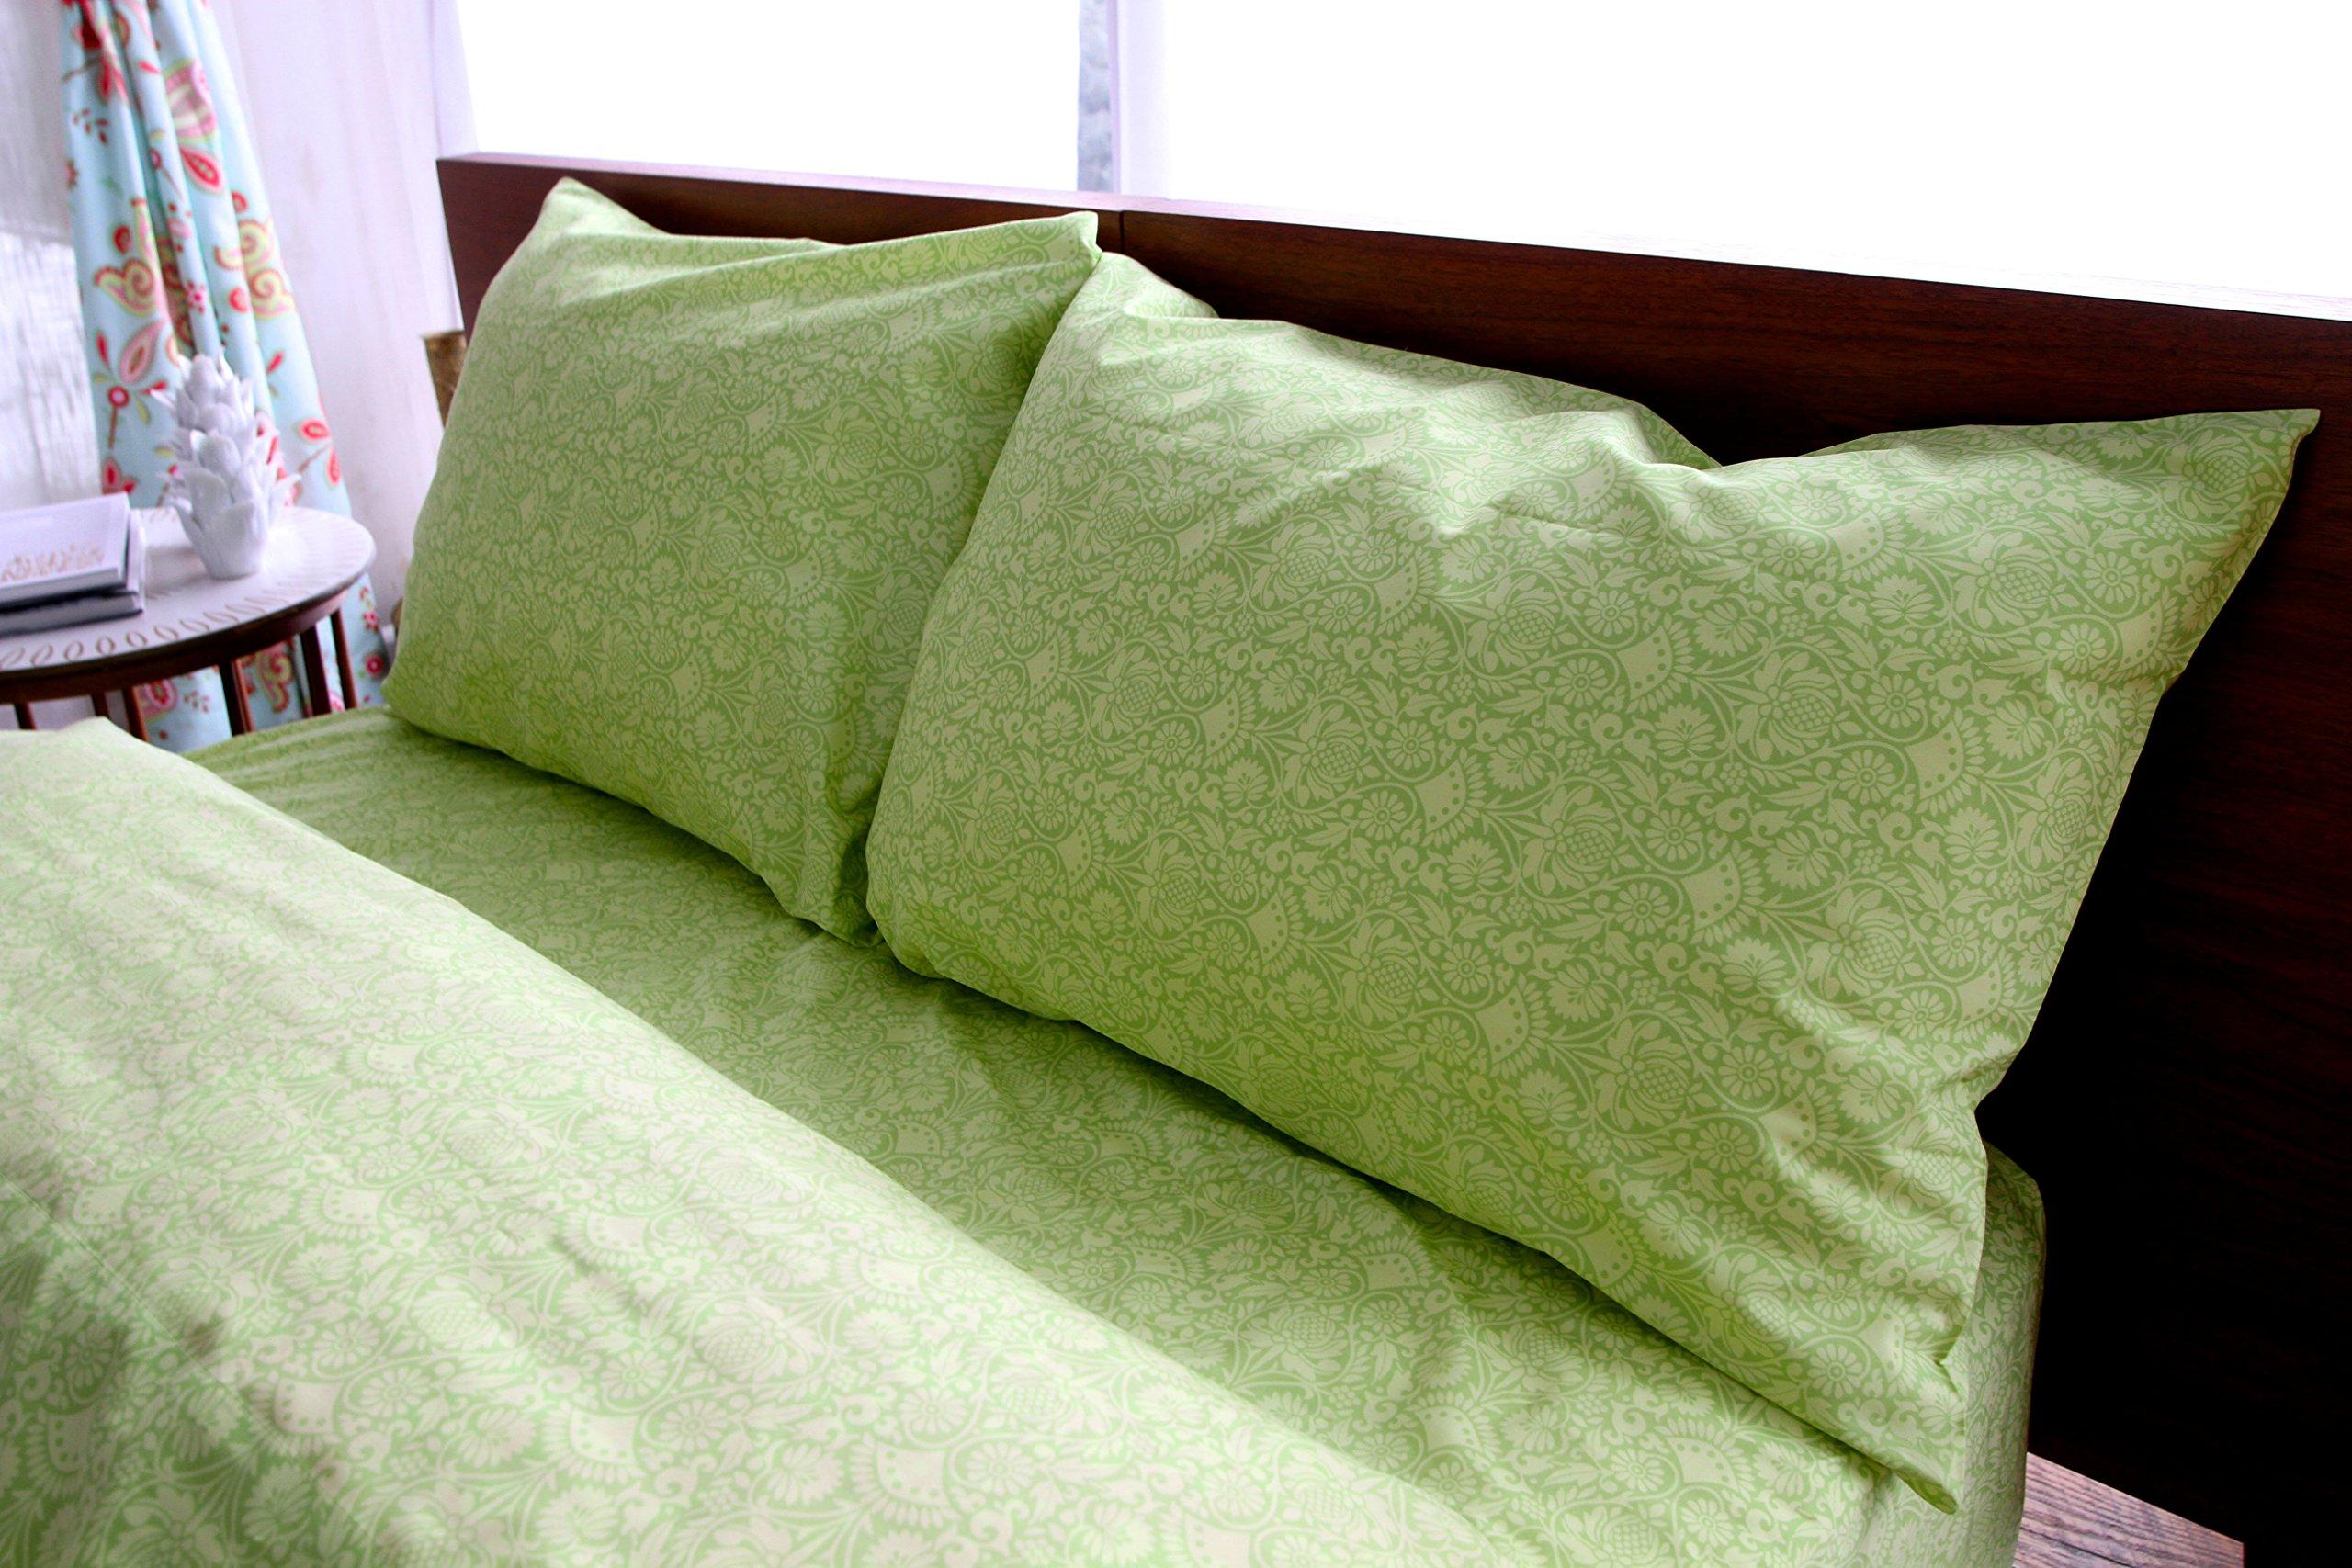 Amy Butler Sari Bloom Chartreuse Floral Cotton Sheet Set, King